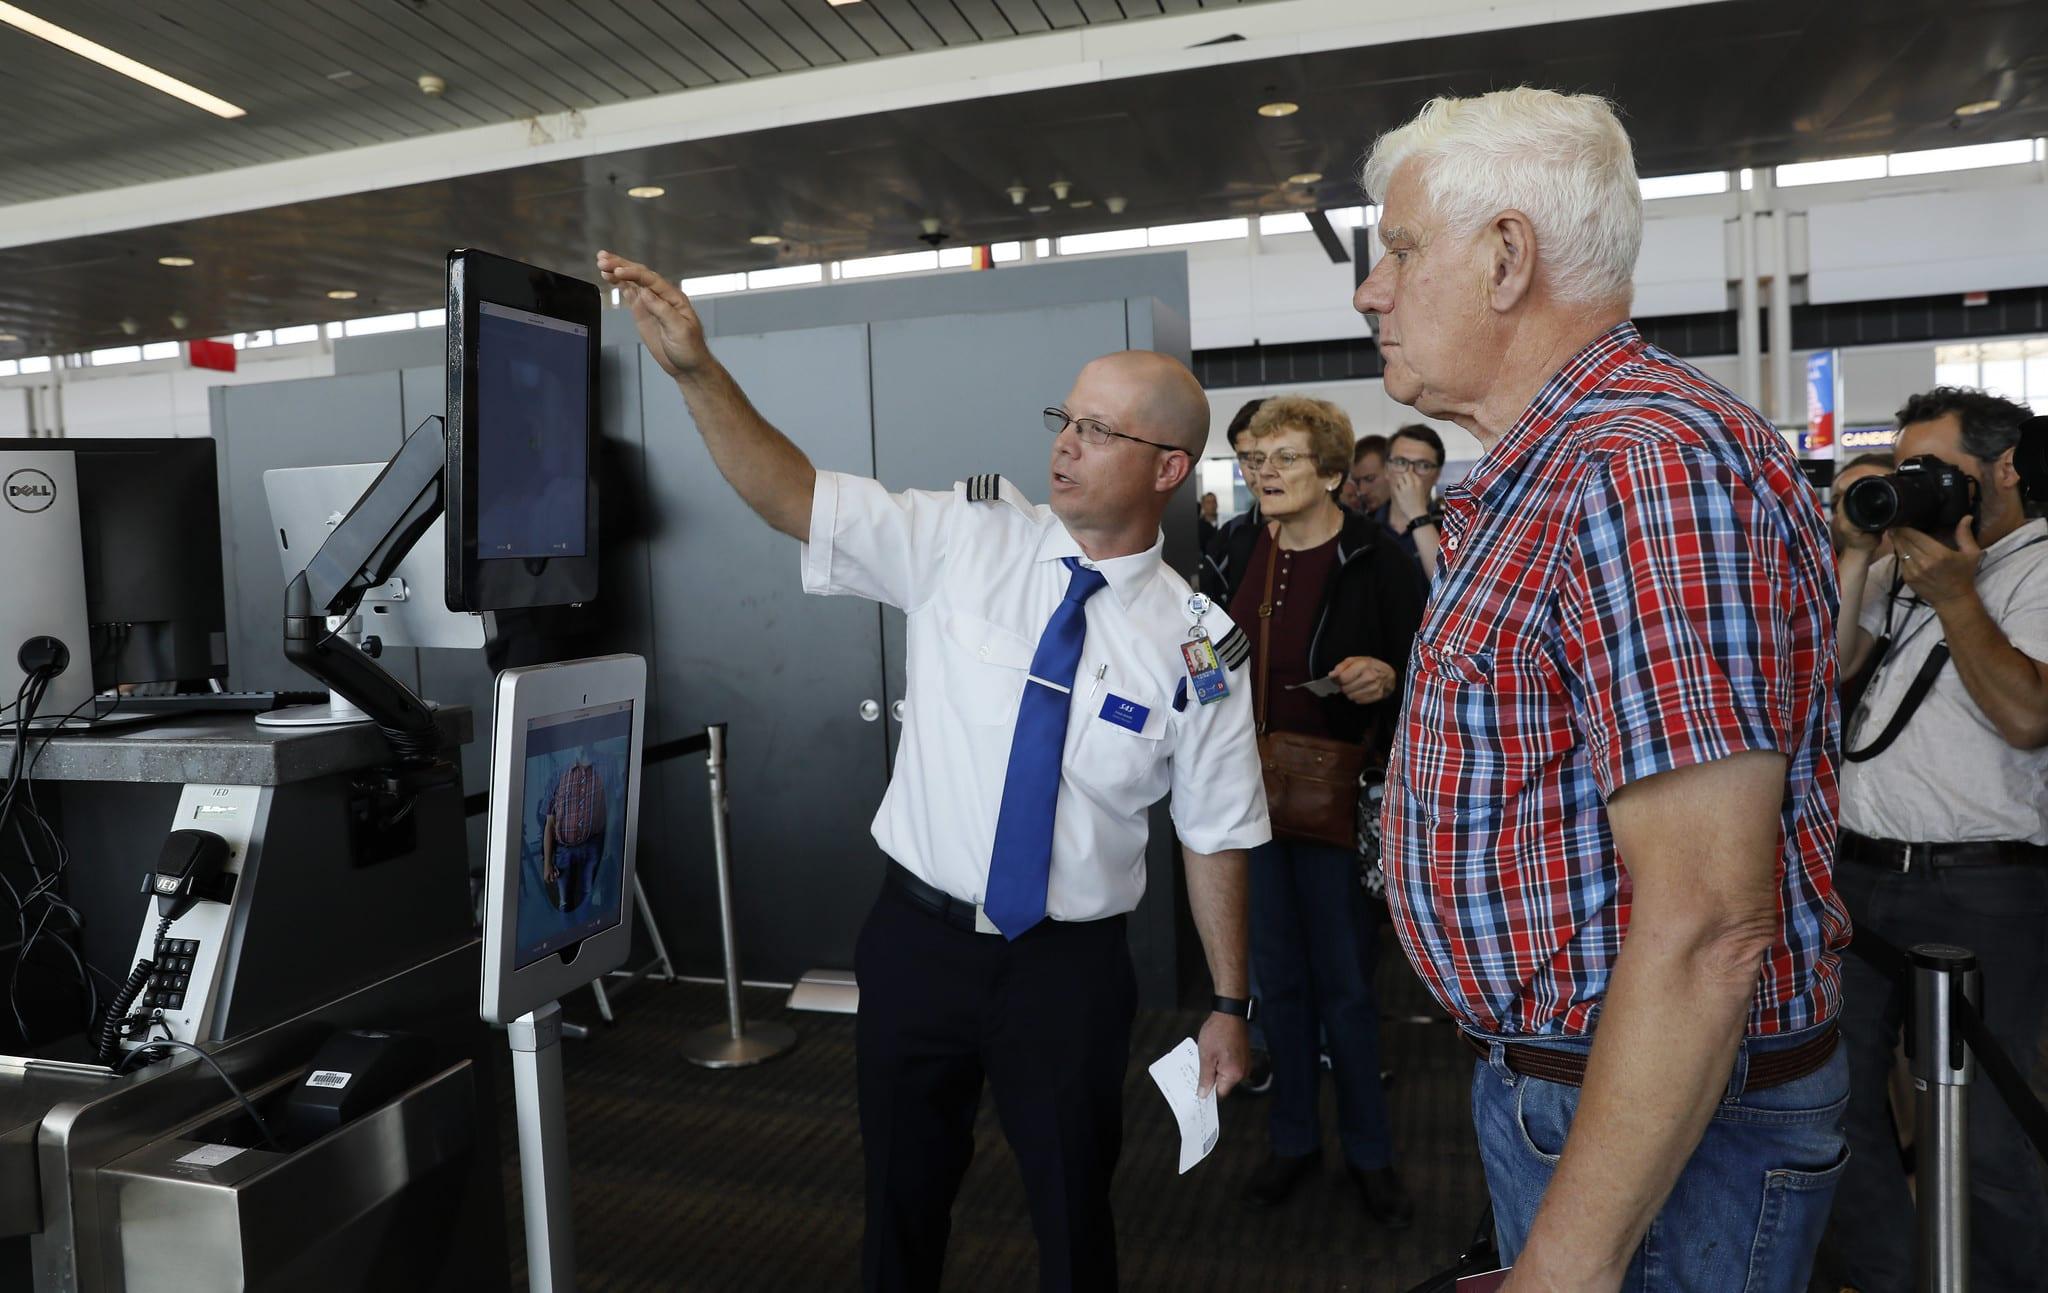 facial recognition biometrics dulles